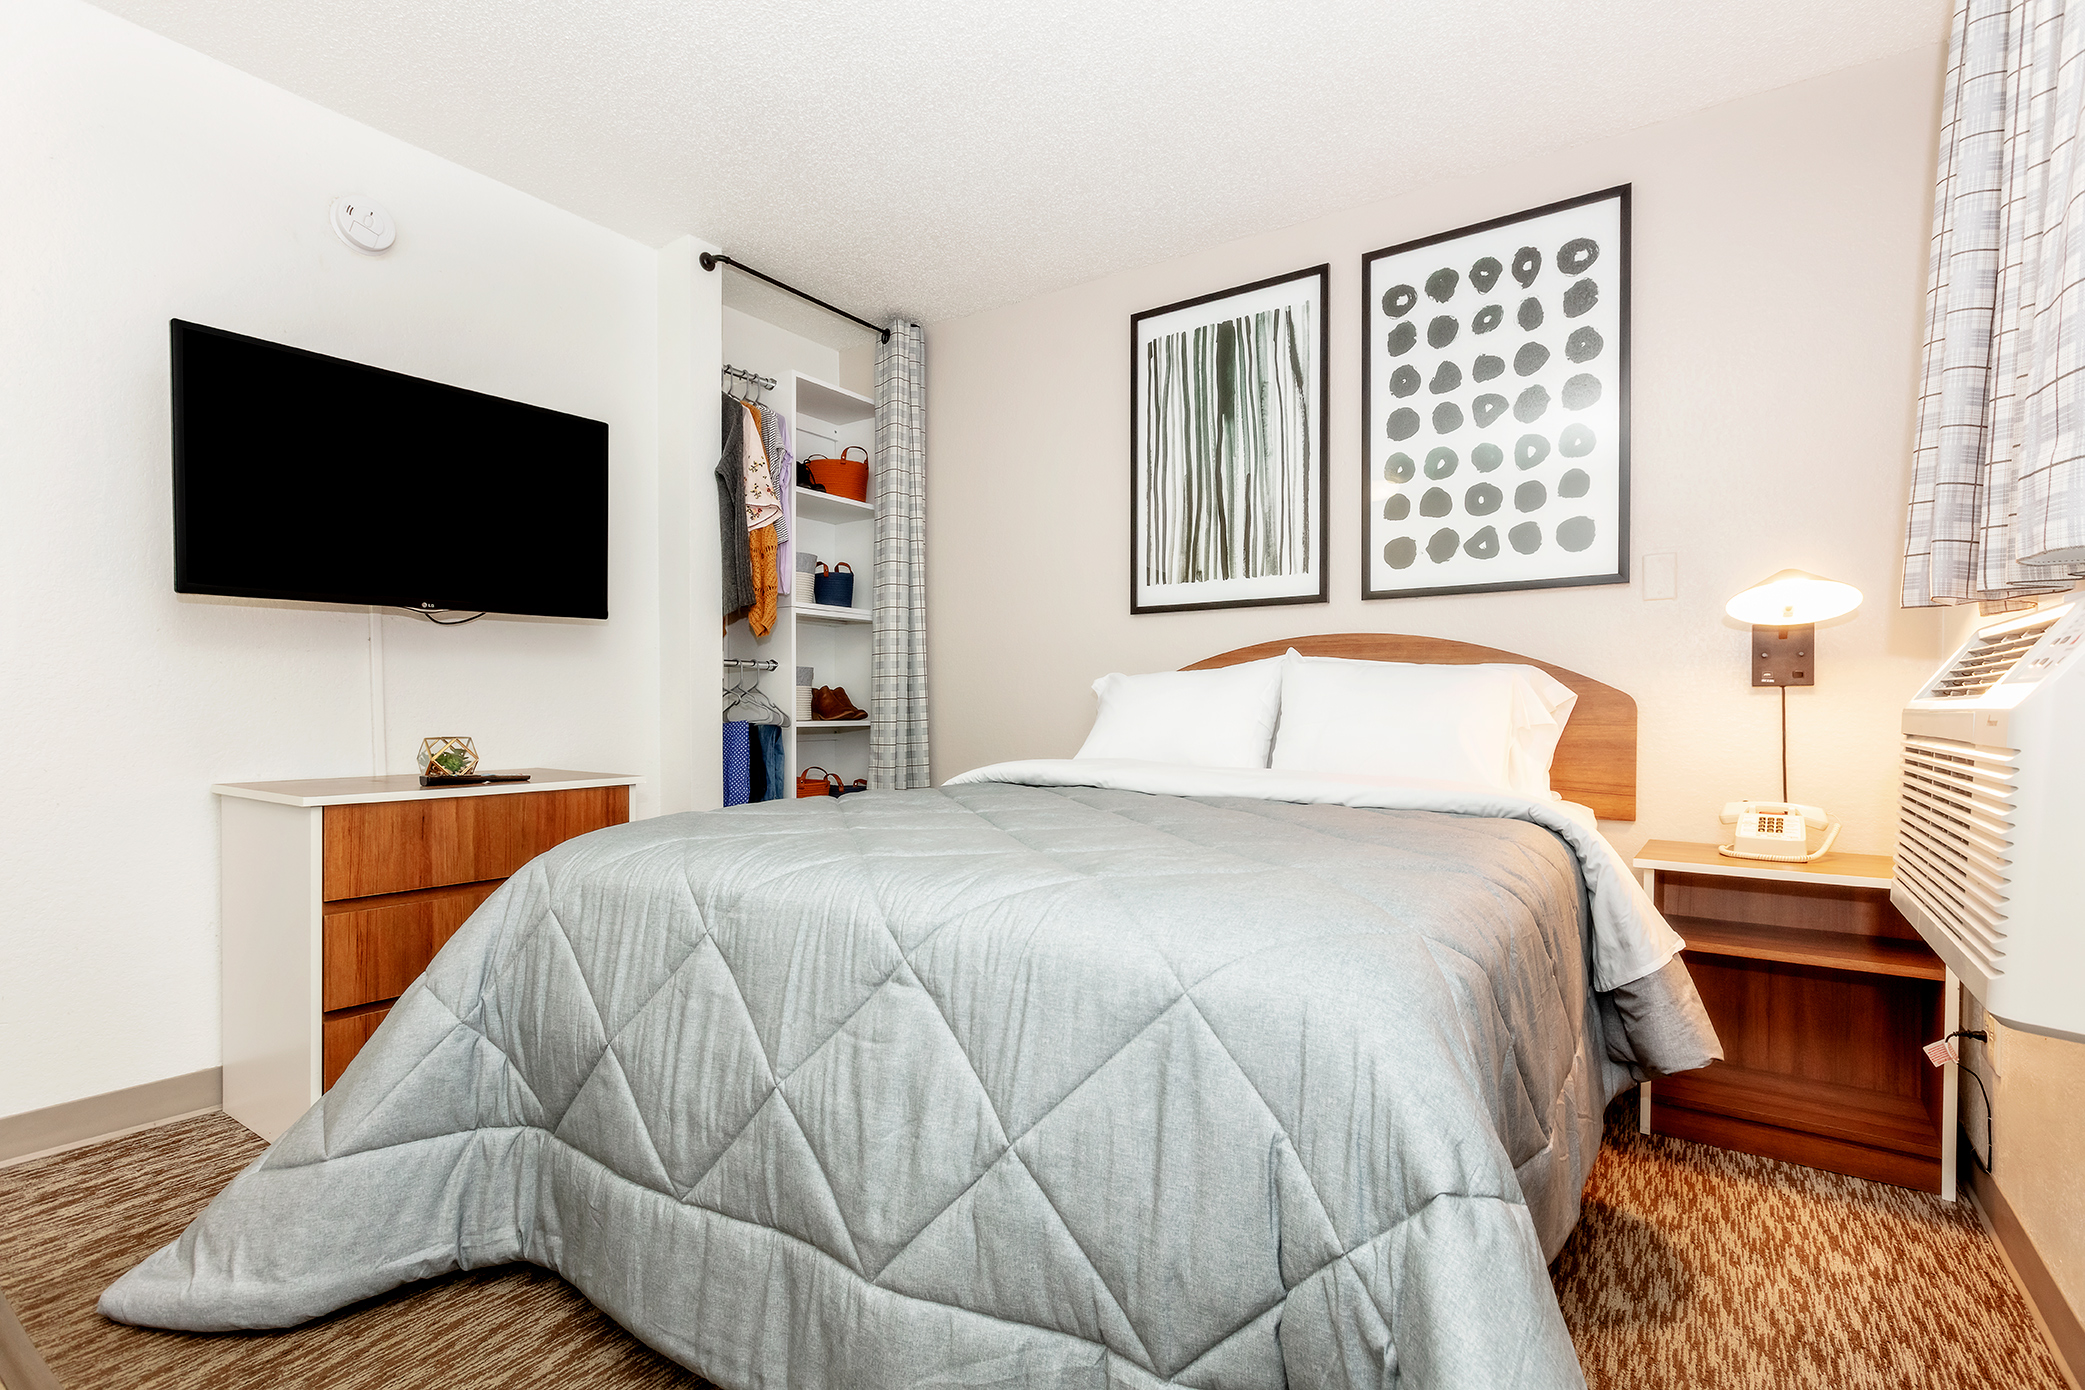 InTown Suites Extended Stay Baton Rouge LA